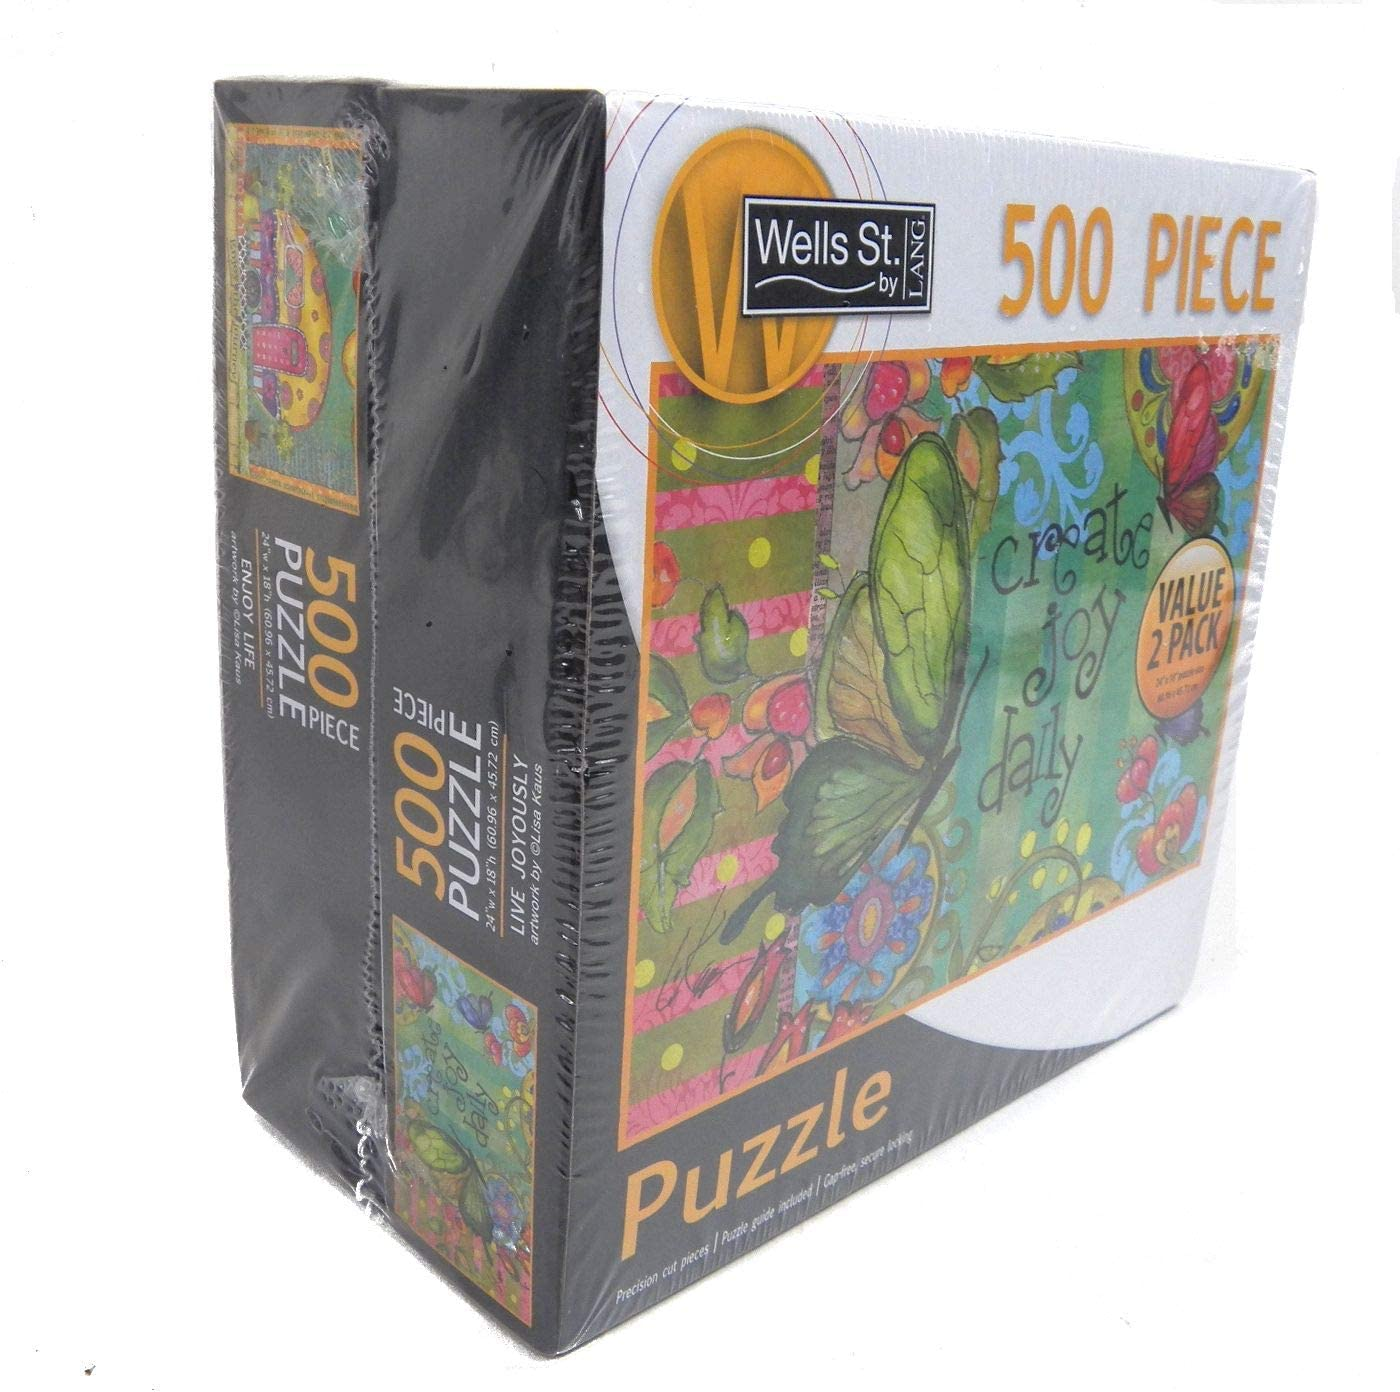 Lang Wells Street 500 Piece Puzzle Live Joyously /& Enjoy Life Value 2 Pack